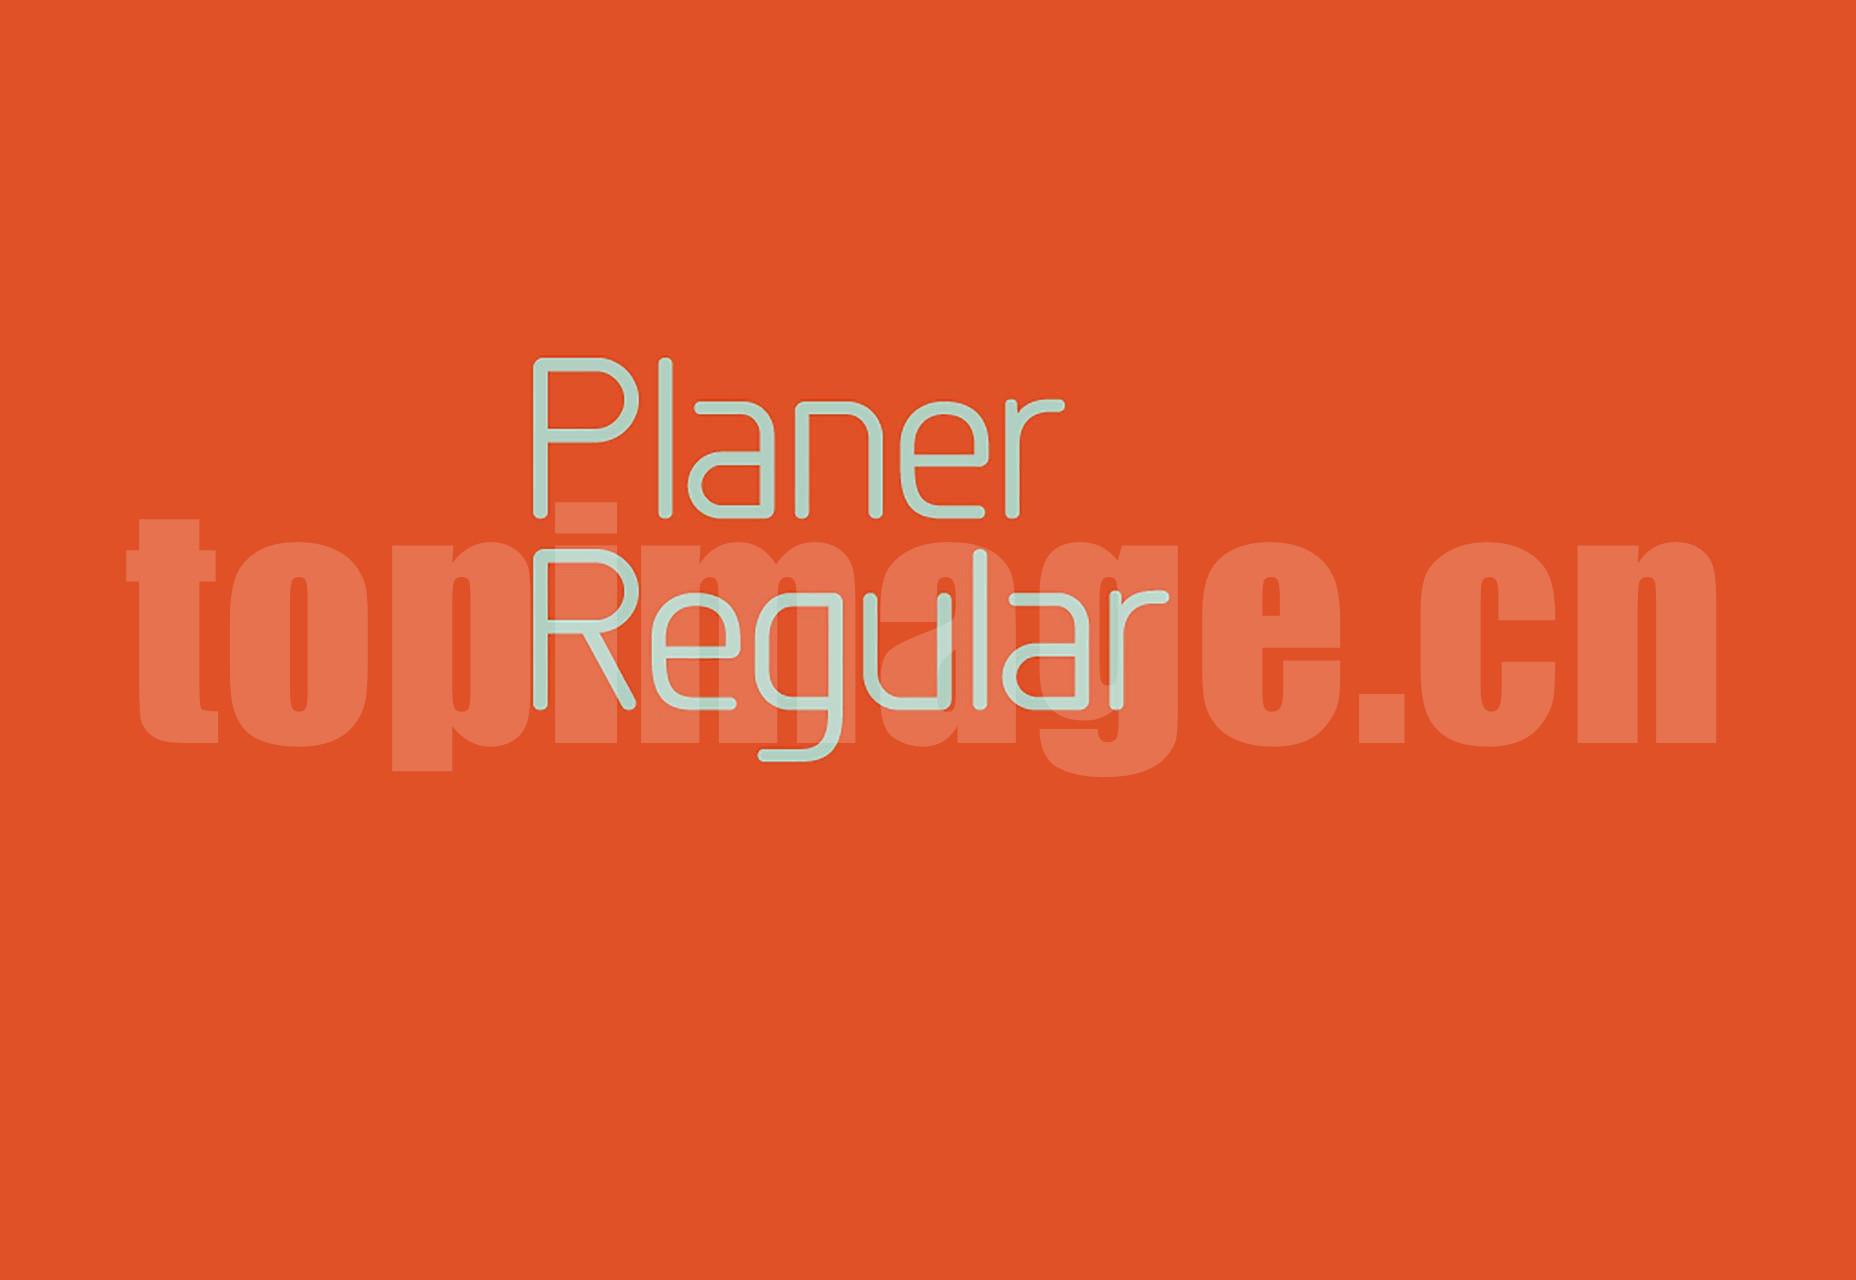 Planer_Reg 海报logo设计字体 简洁纤细 英文字体下载